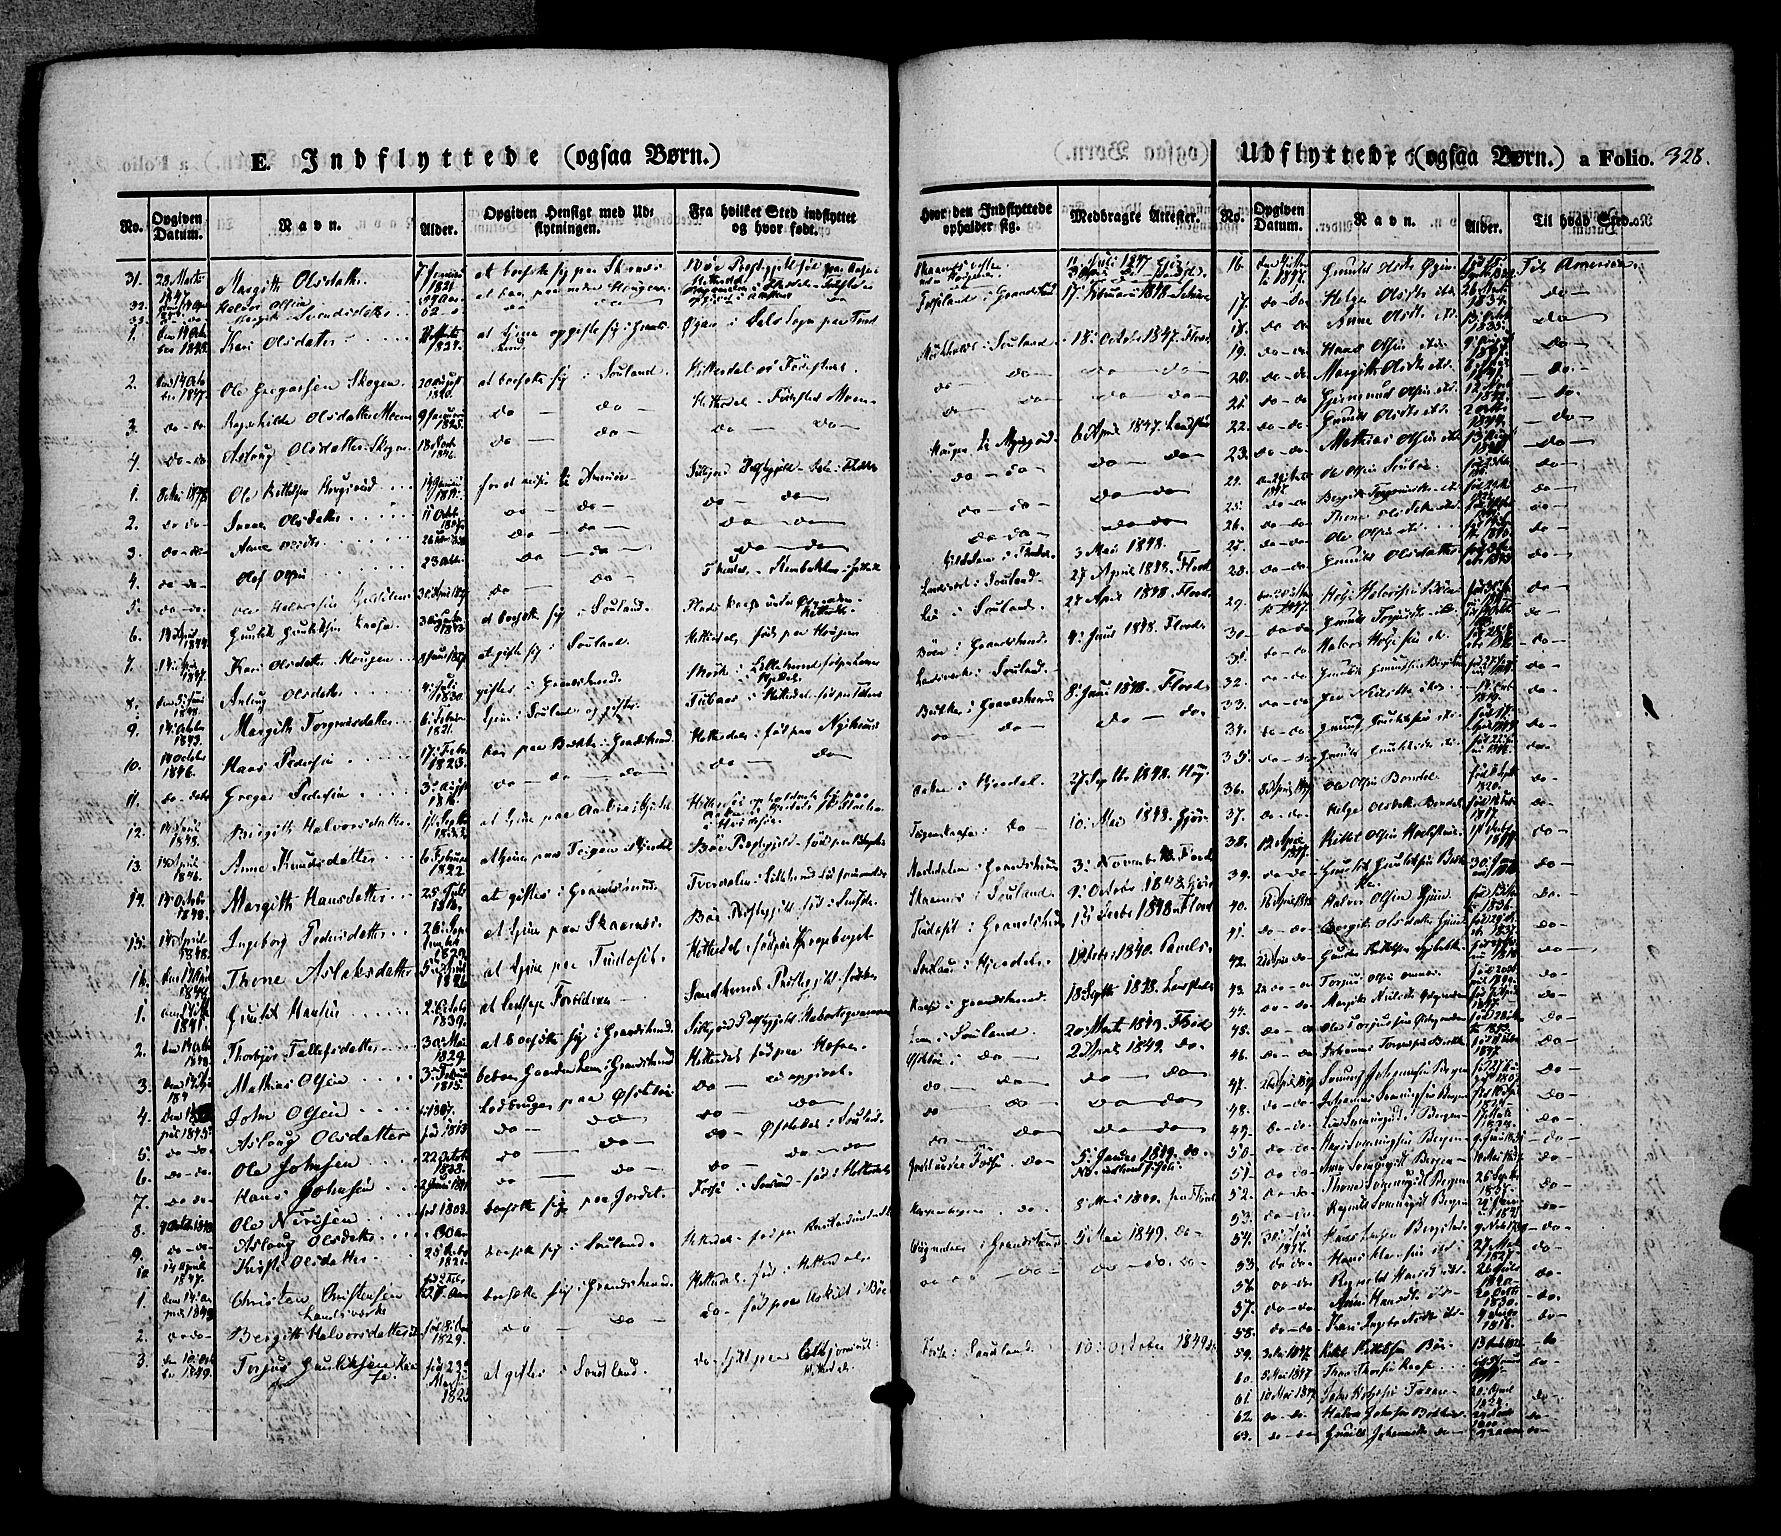 SAKO, Hjartdal kirkebøker, F/Fa/L0008: Ministerialbok nr. I 8, 1844-1859, s. 328